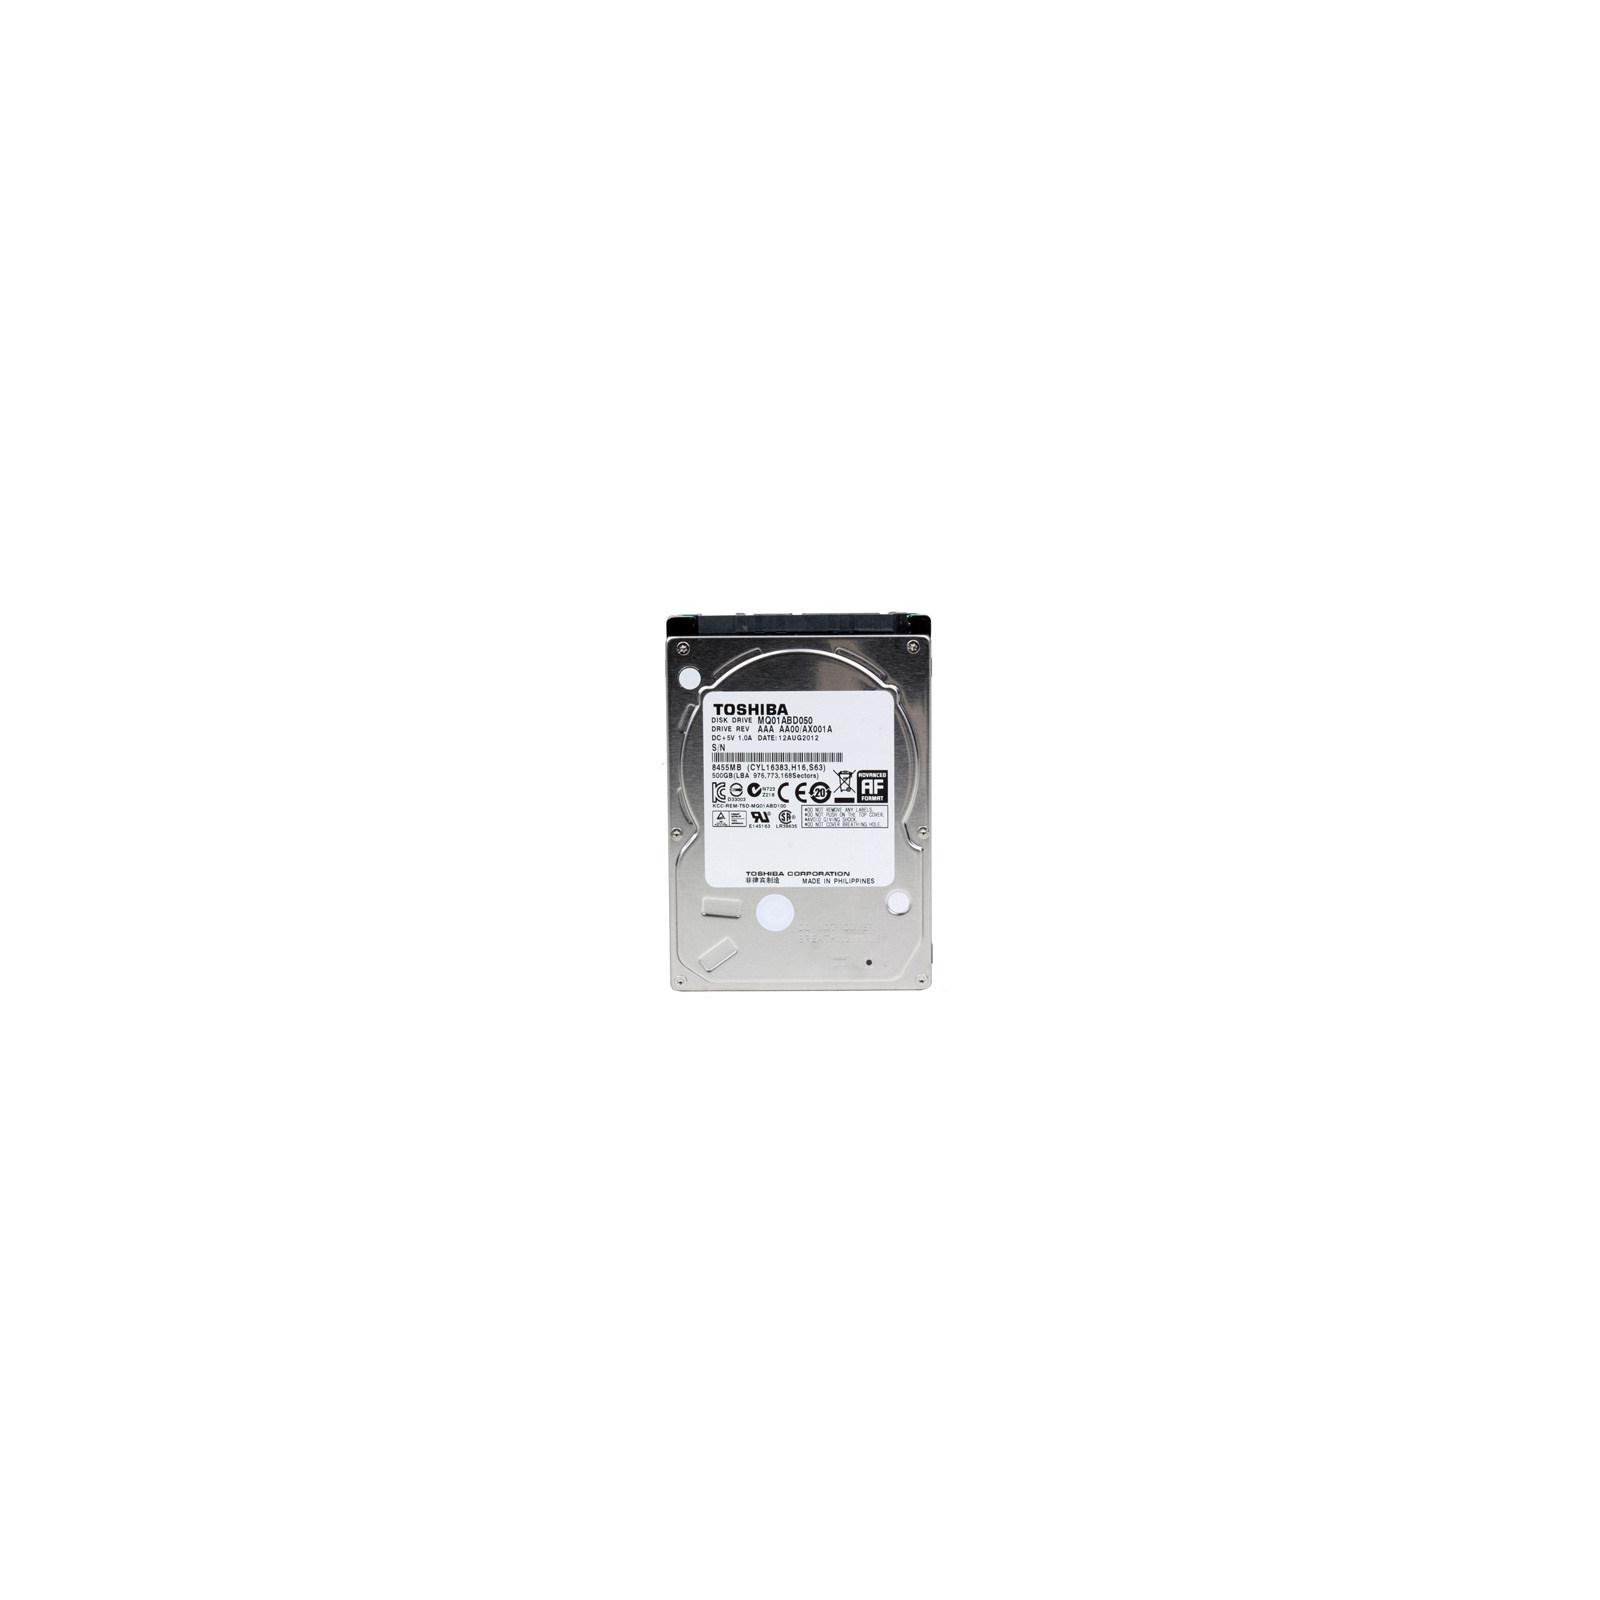 "Жесткий диск для ноутбука 2.5"" 500GB TOSHIBA (MQ01ABD050)"